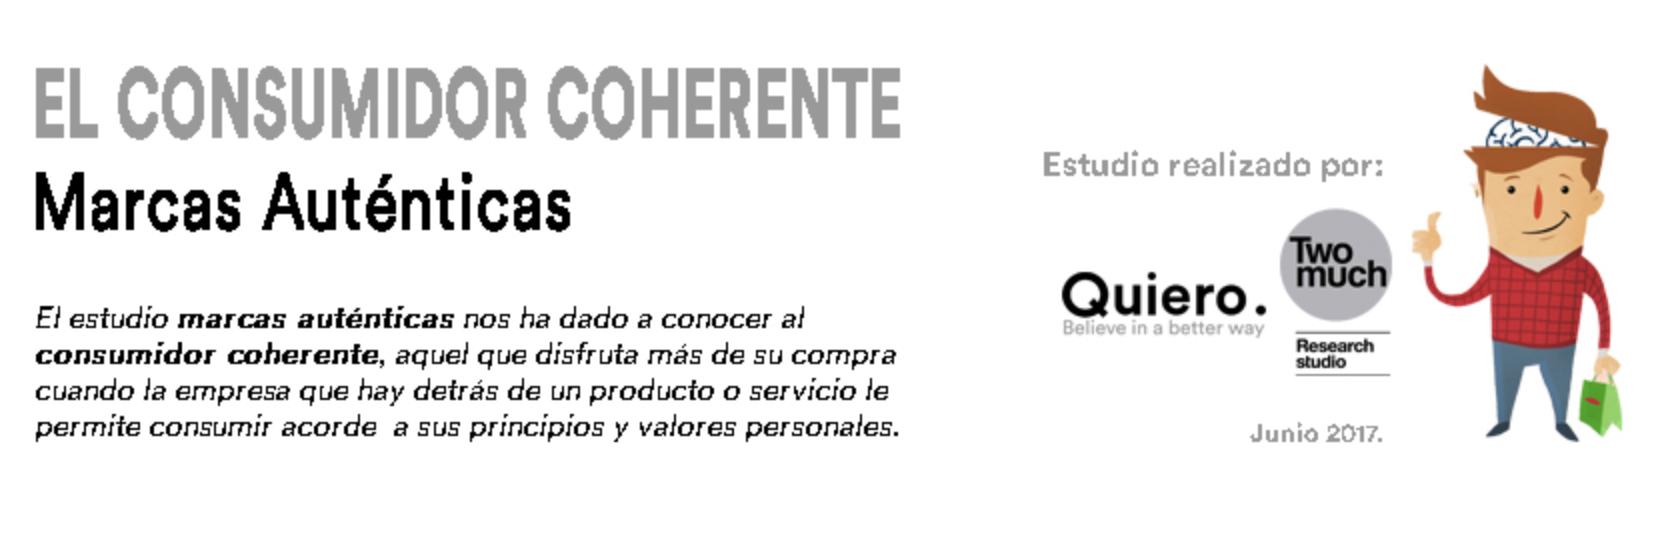 Consumidor_Coherente_Autores